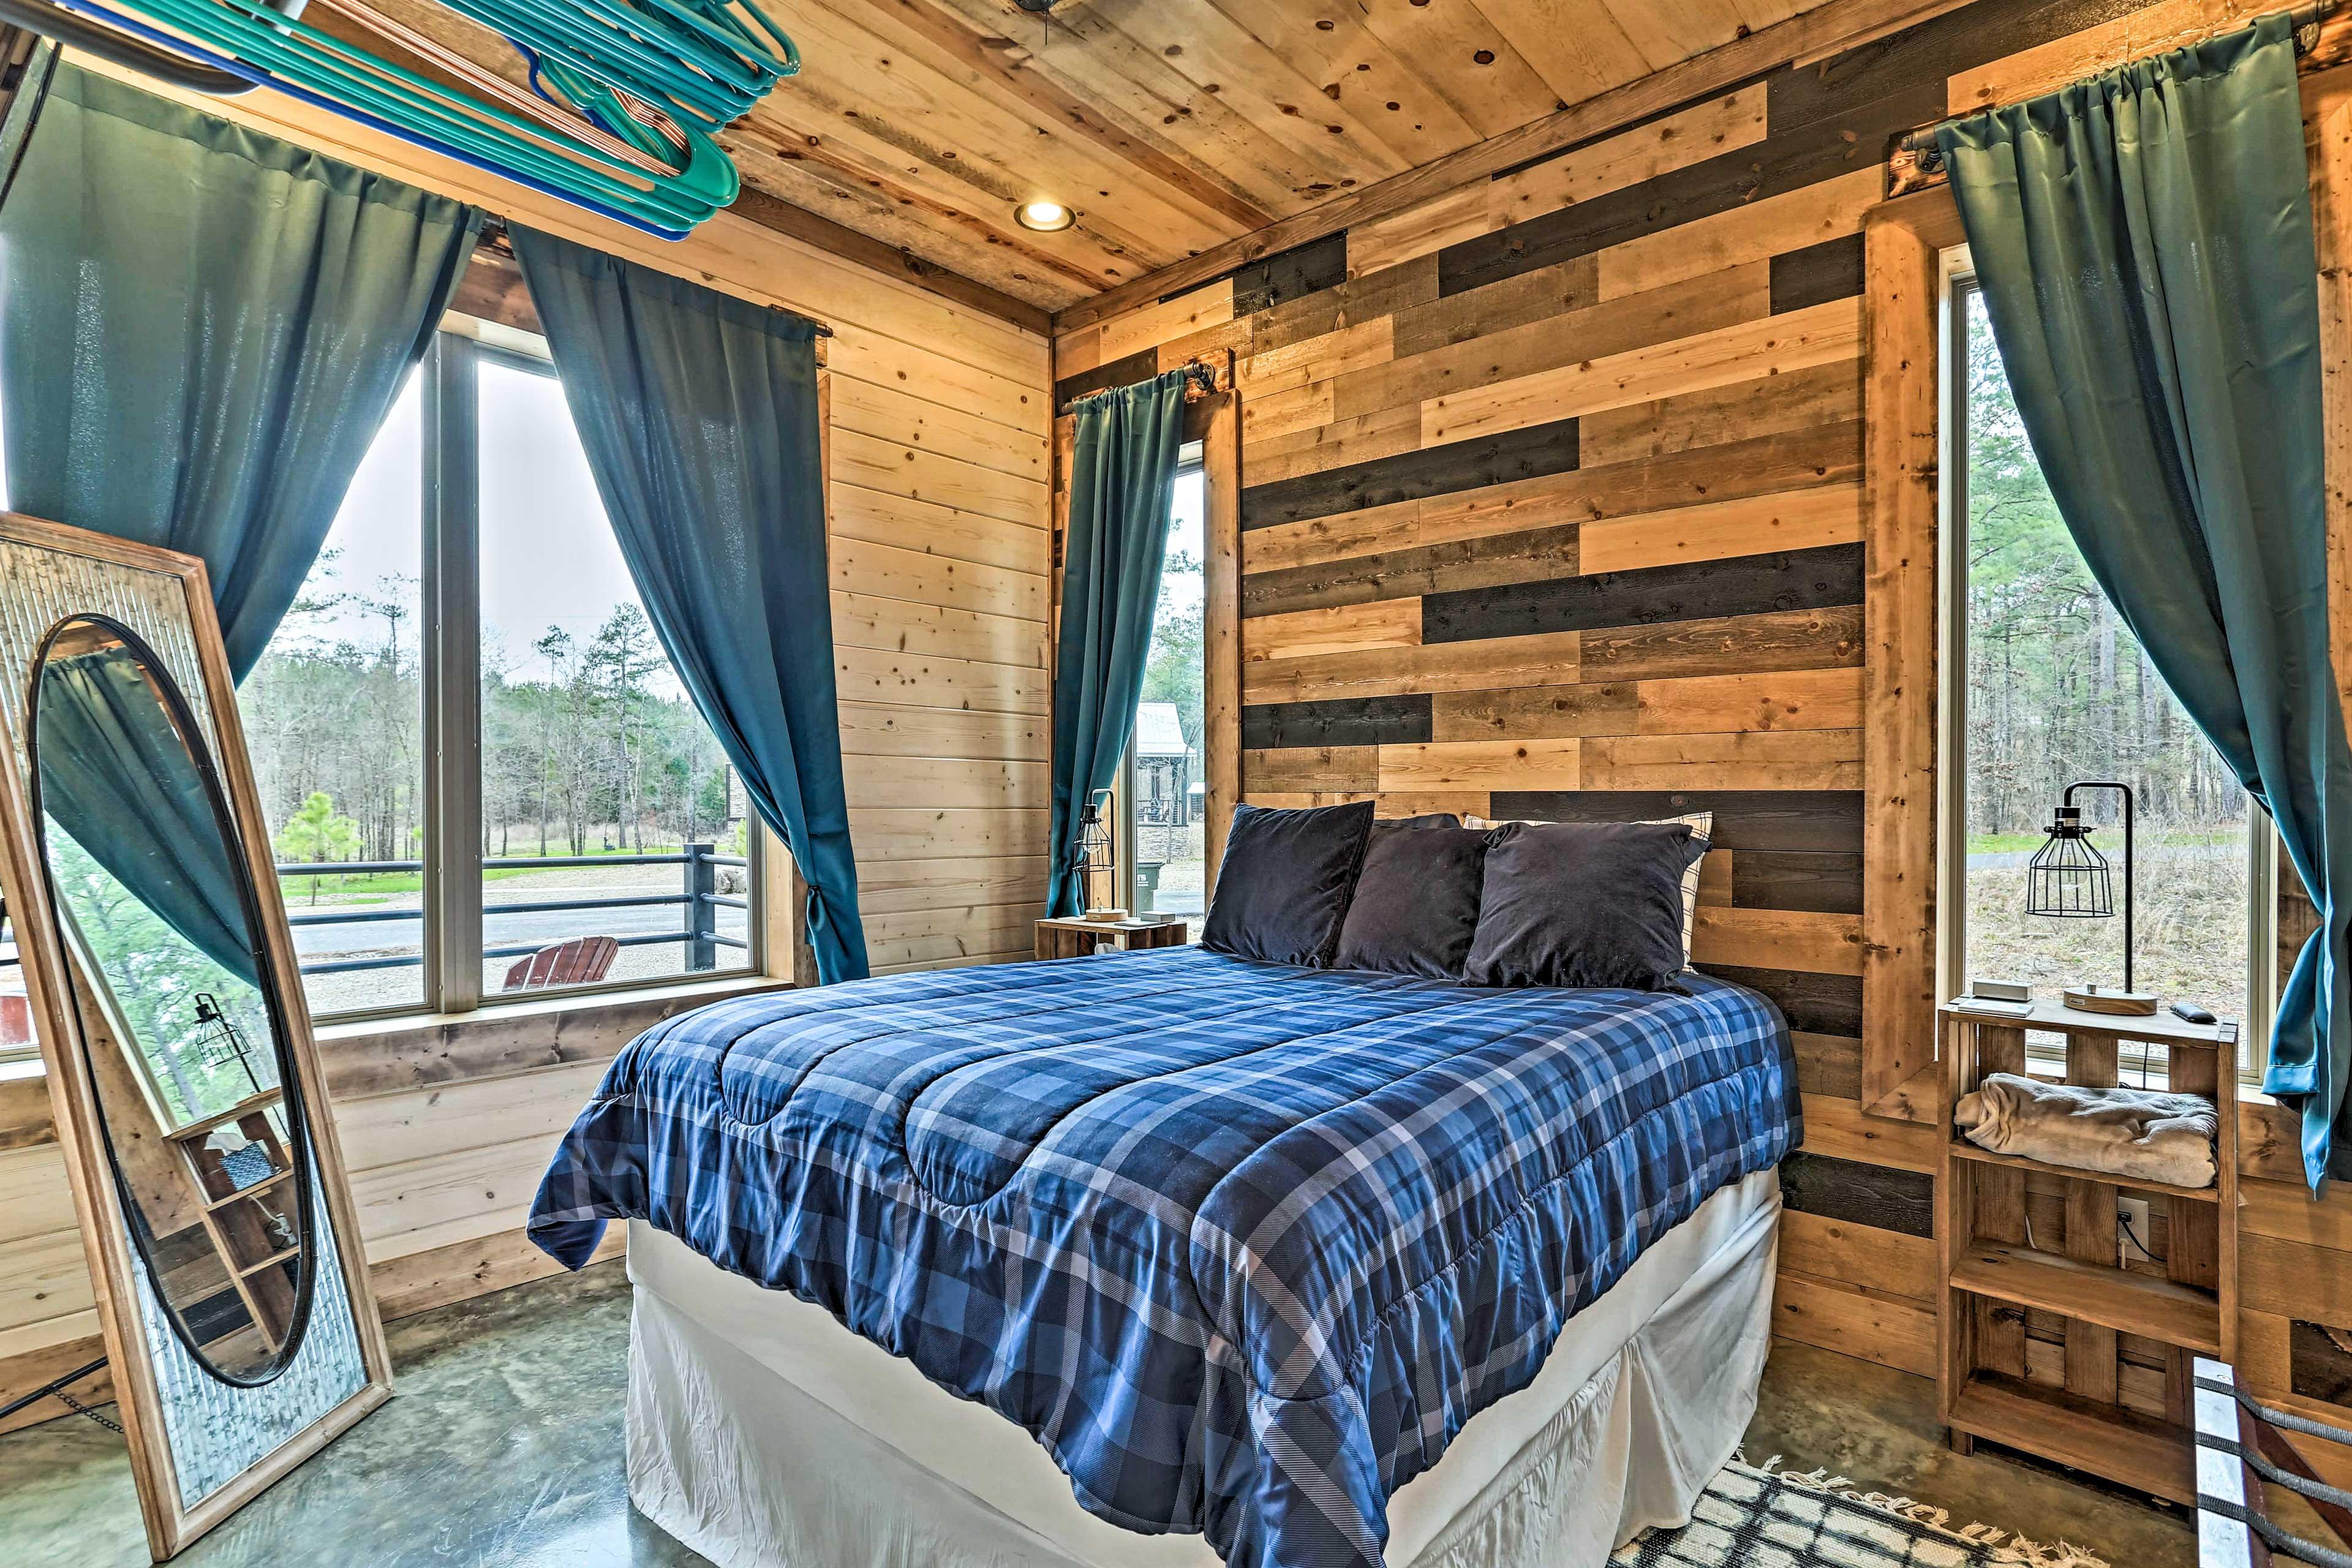 Let your worries melt away as you lay in the queen bed of bedroom 2.